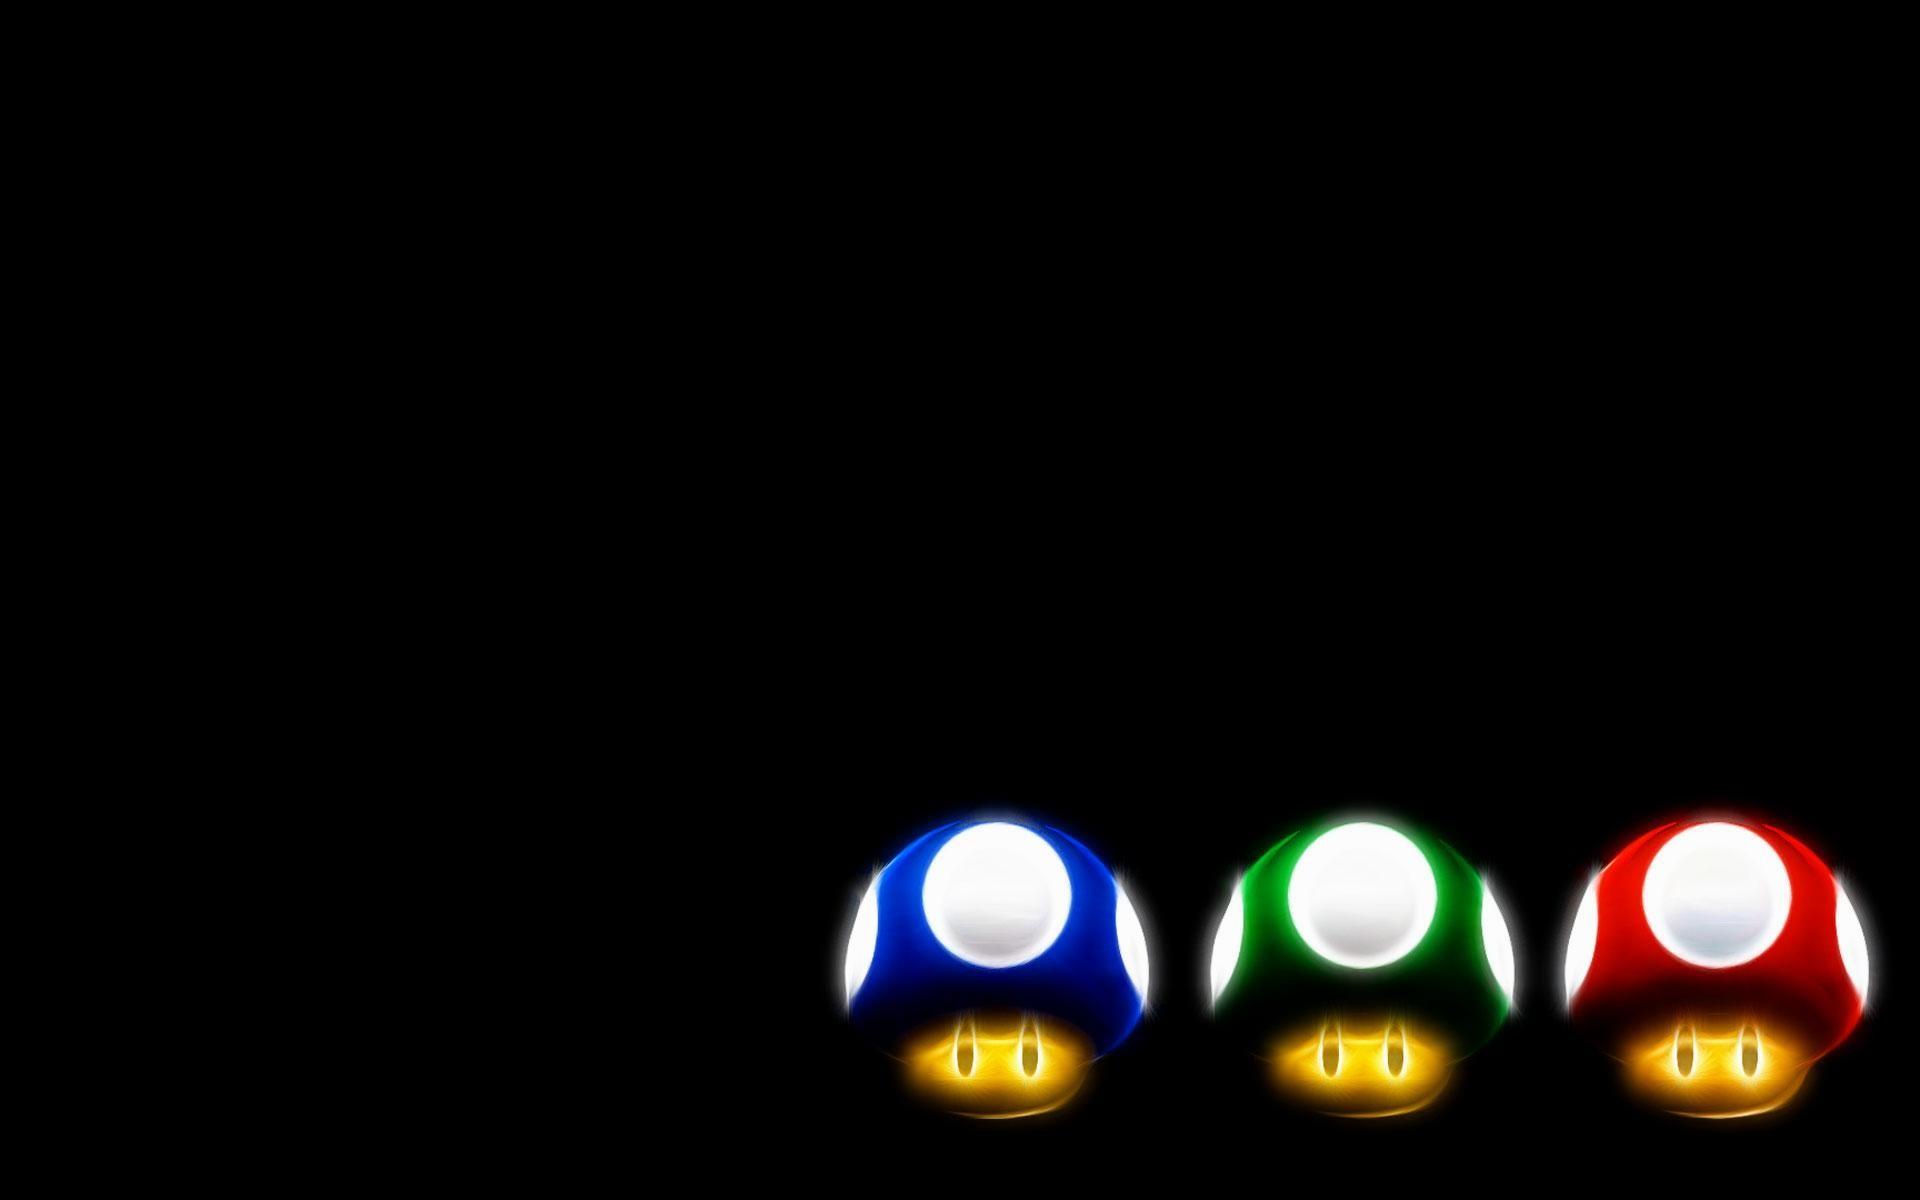 Super-Mario-Mushrooms-Wallpaper-1